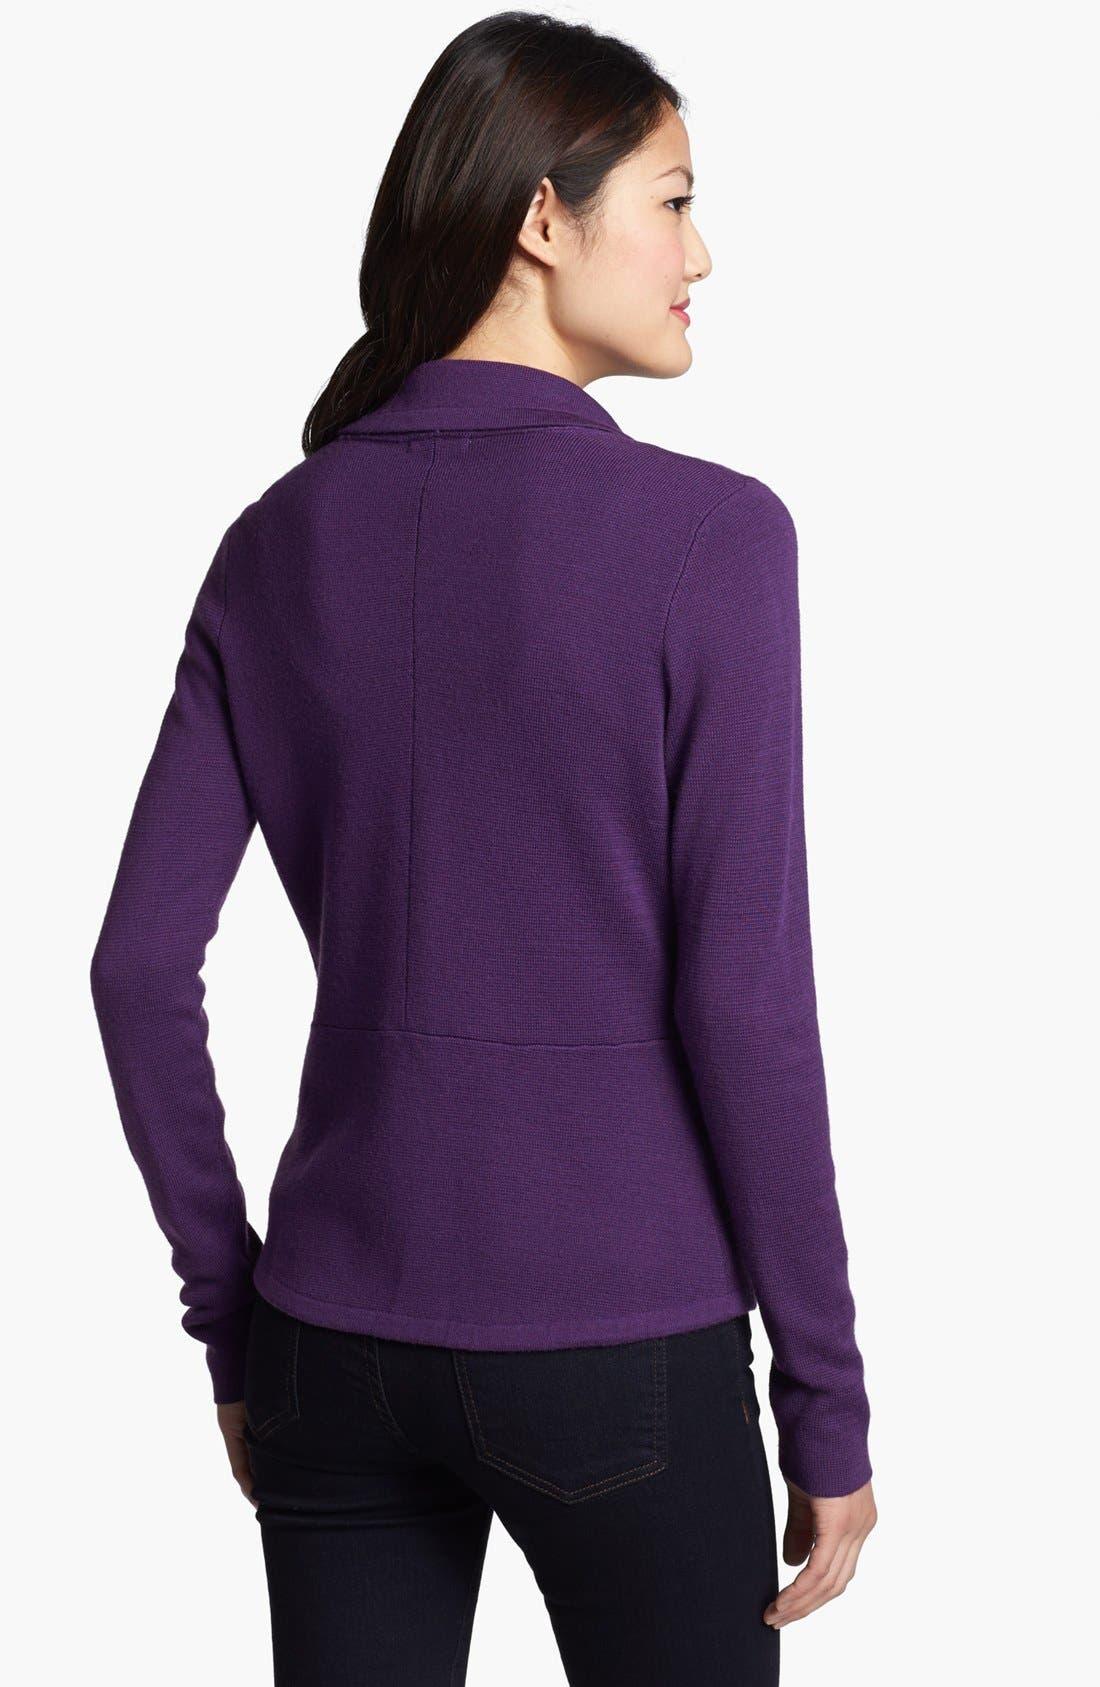 Main Image - Halogen® Sweater Jacket, Cardigan Leather Skirt & Caslon® Tee